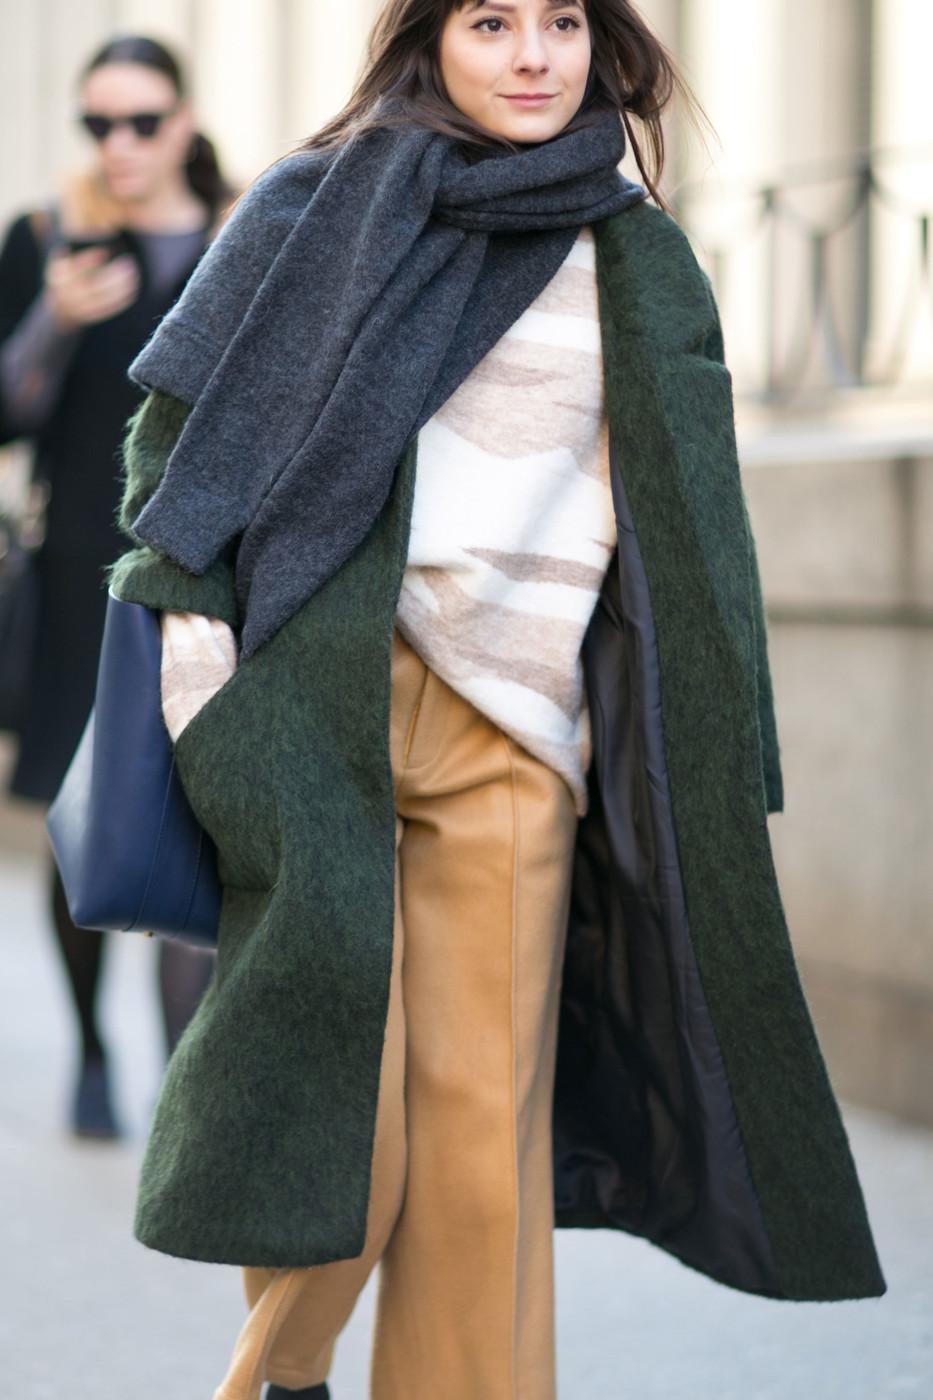 The Best Attendee Street Style at #NYFW Autumn/Winter 2016 ...